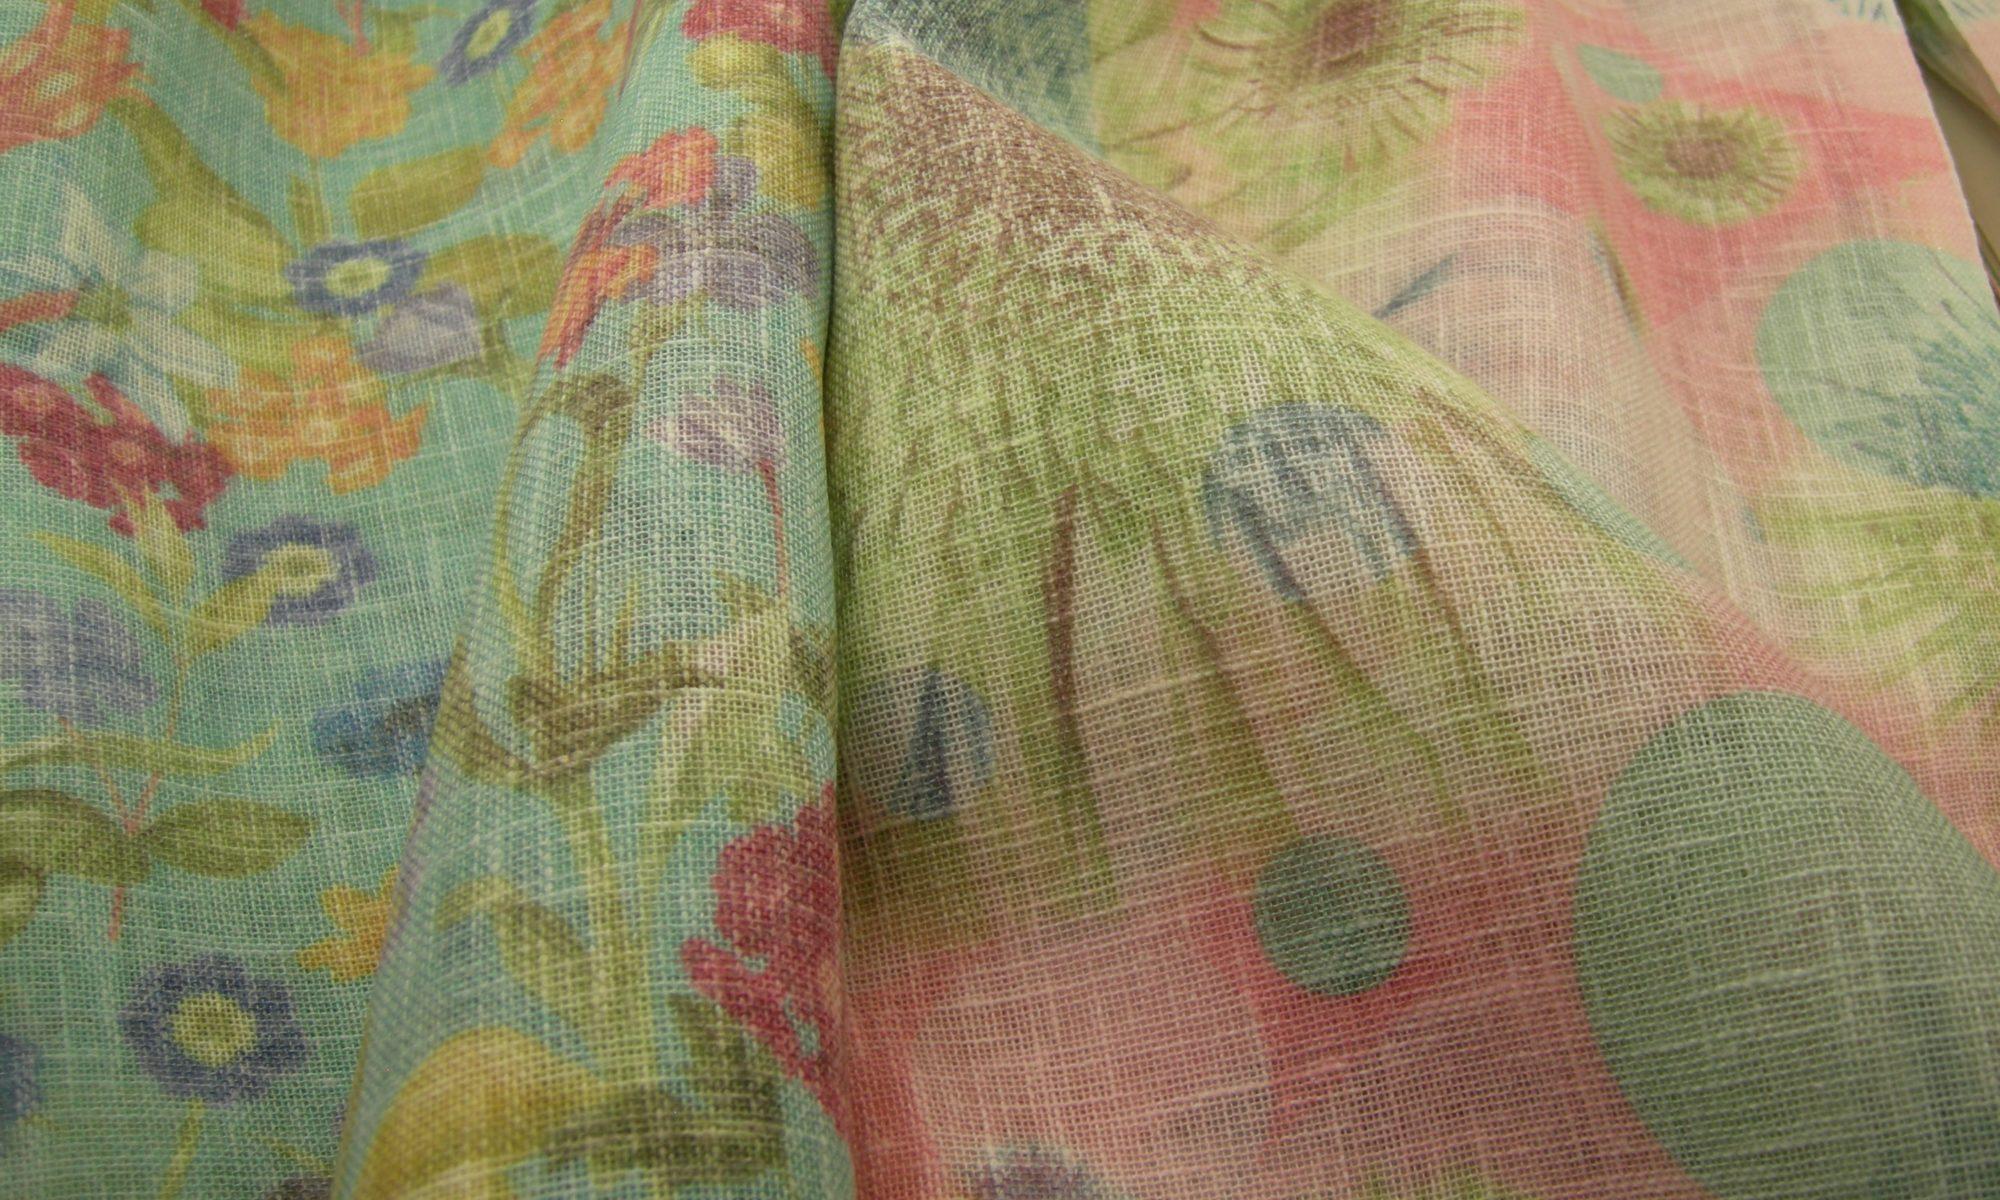 ART 7170 floral print cotton blend shantung slub shirt jacket fabric WIDTH cm150 WEIGHT gr150 COMPOSITION 60 polyester 40 cotton - pink and green 100mts each